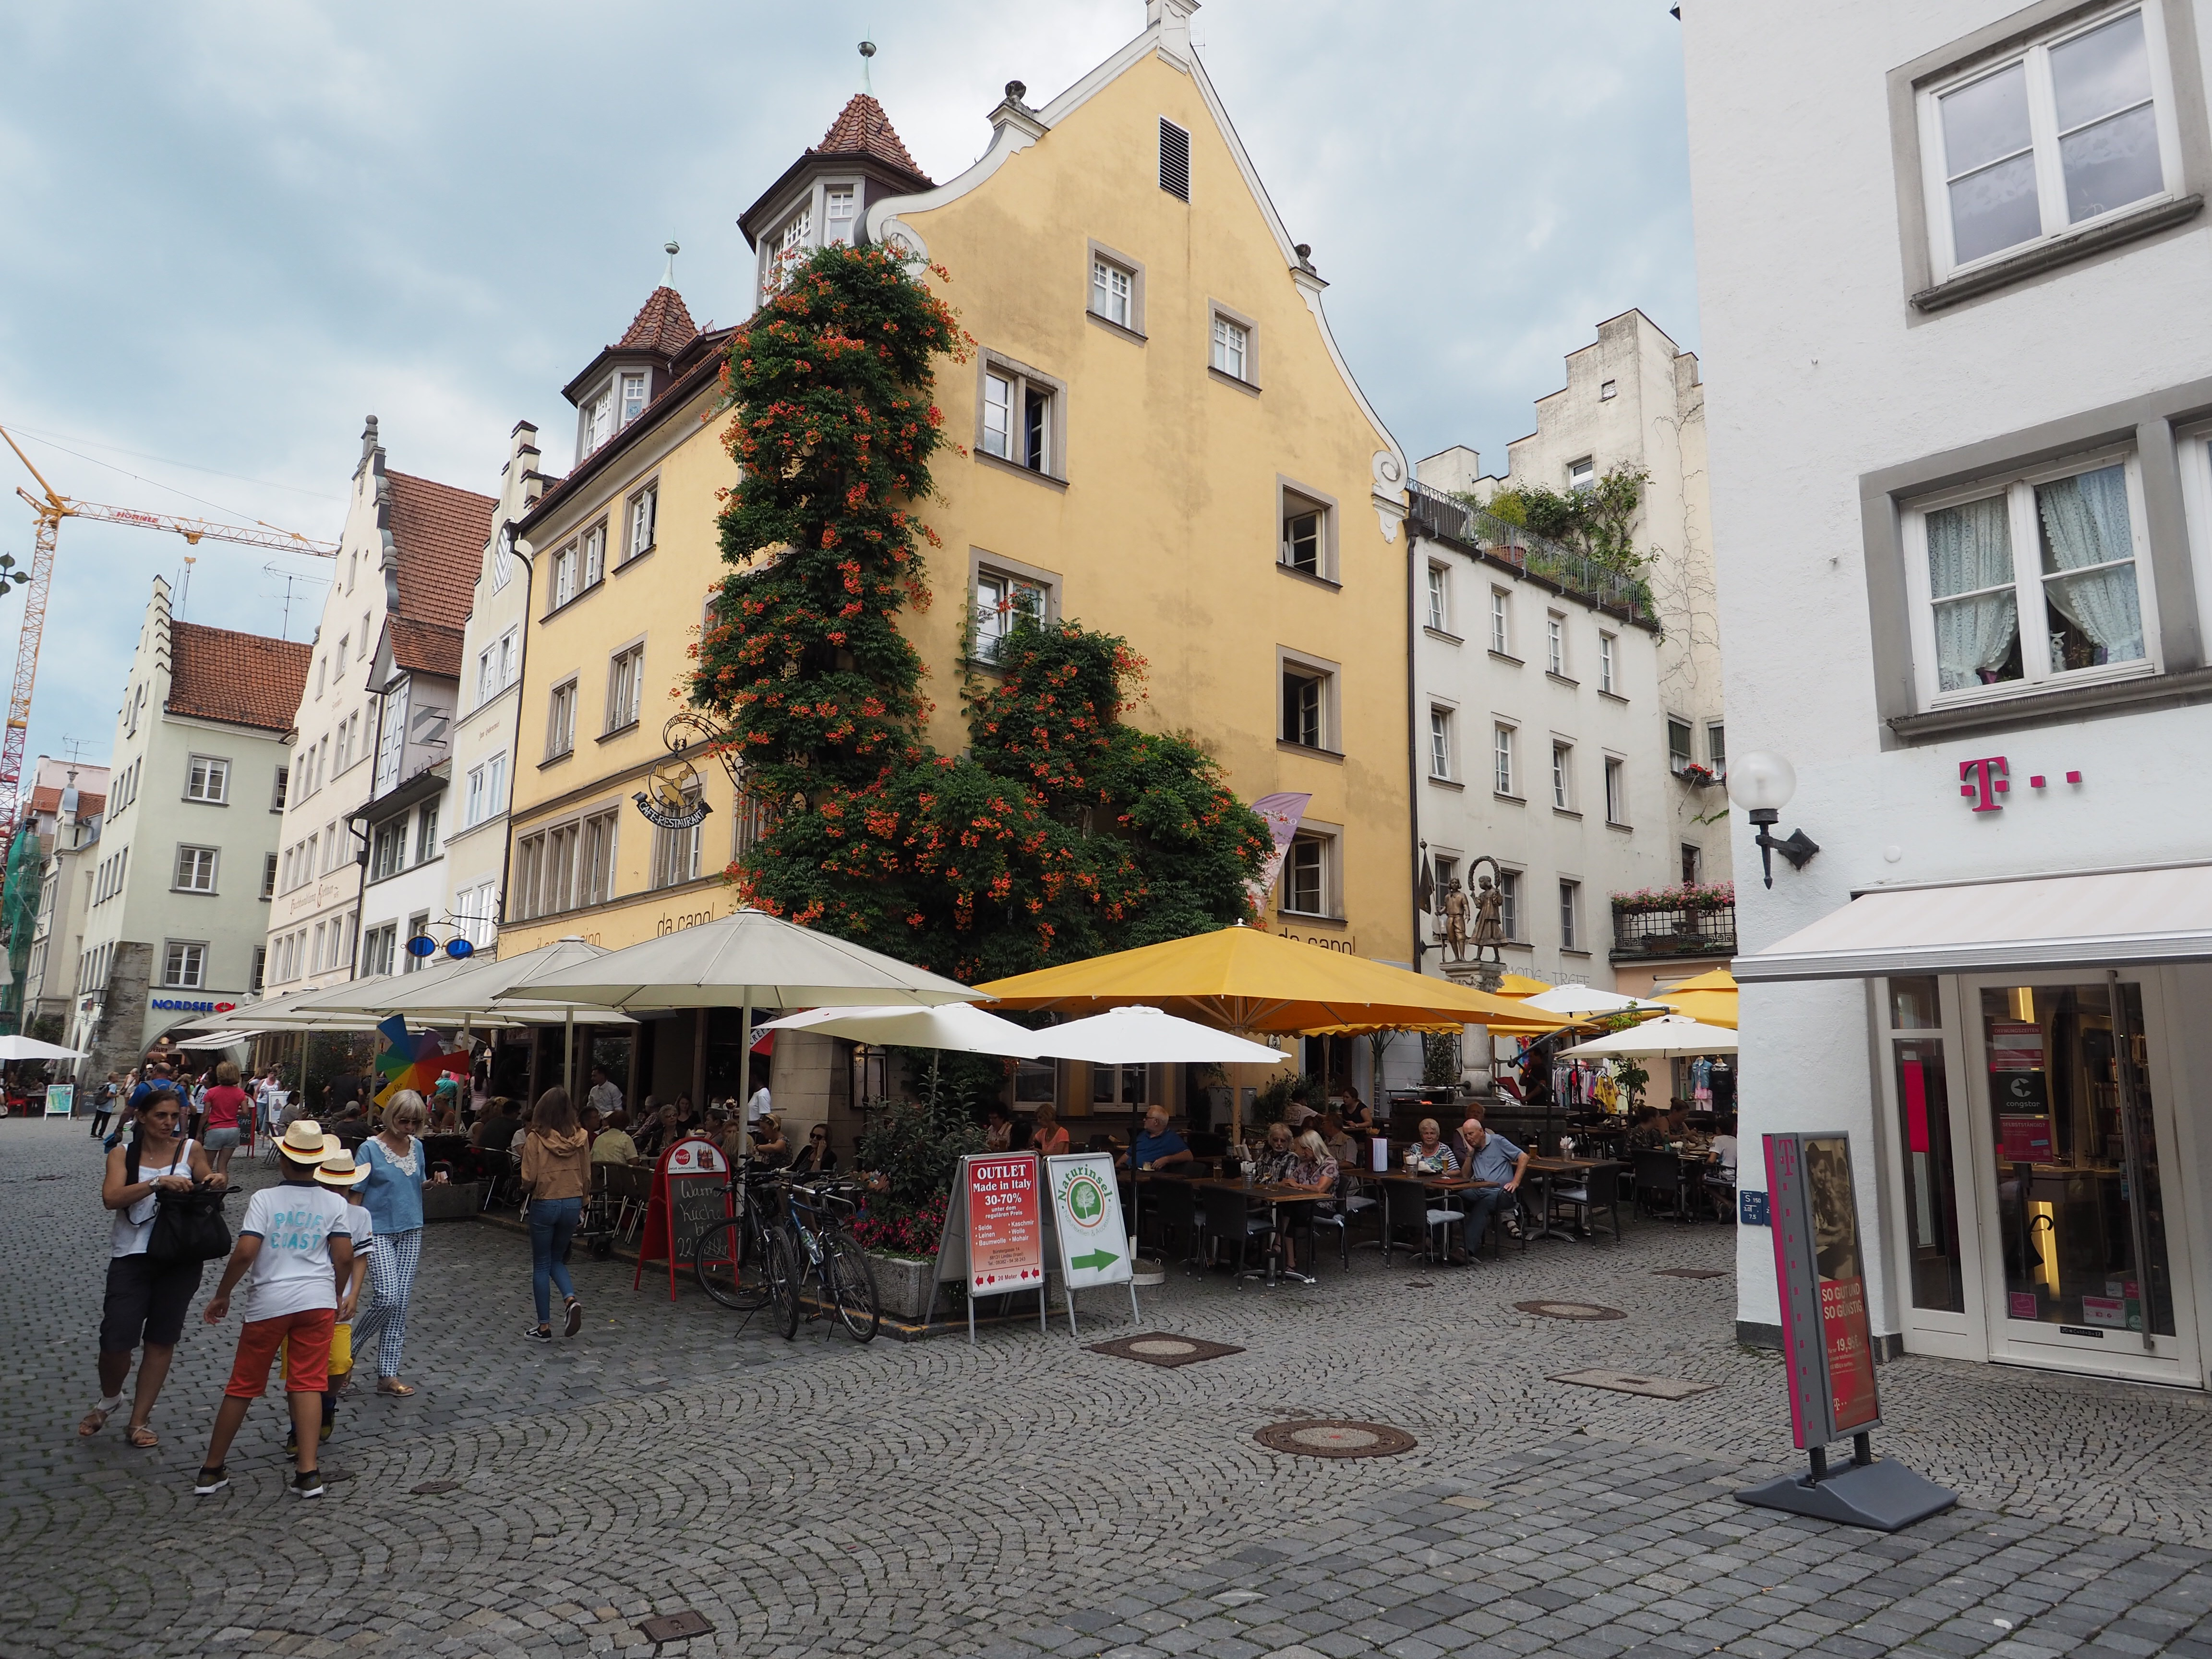 Das Restaurant 'da capol' in der Maximilianstraße